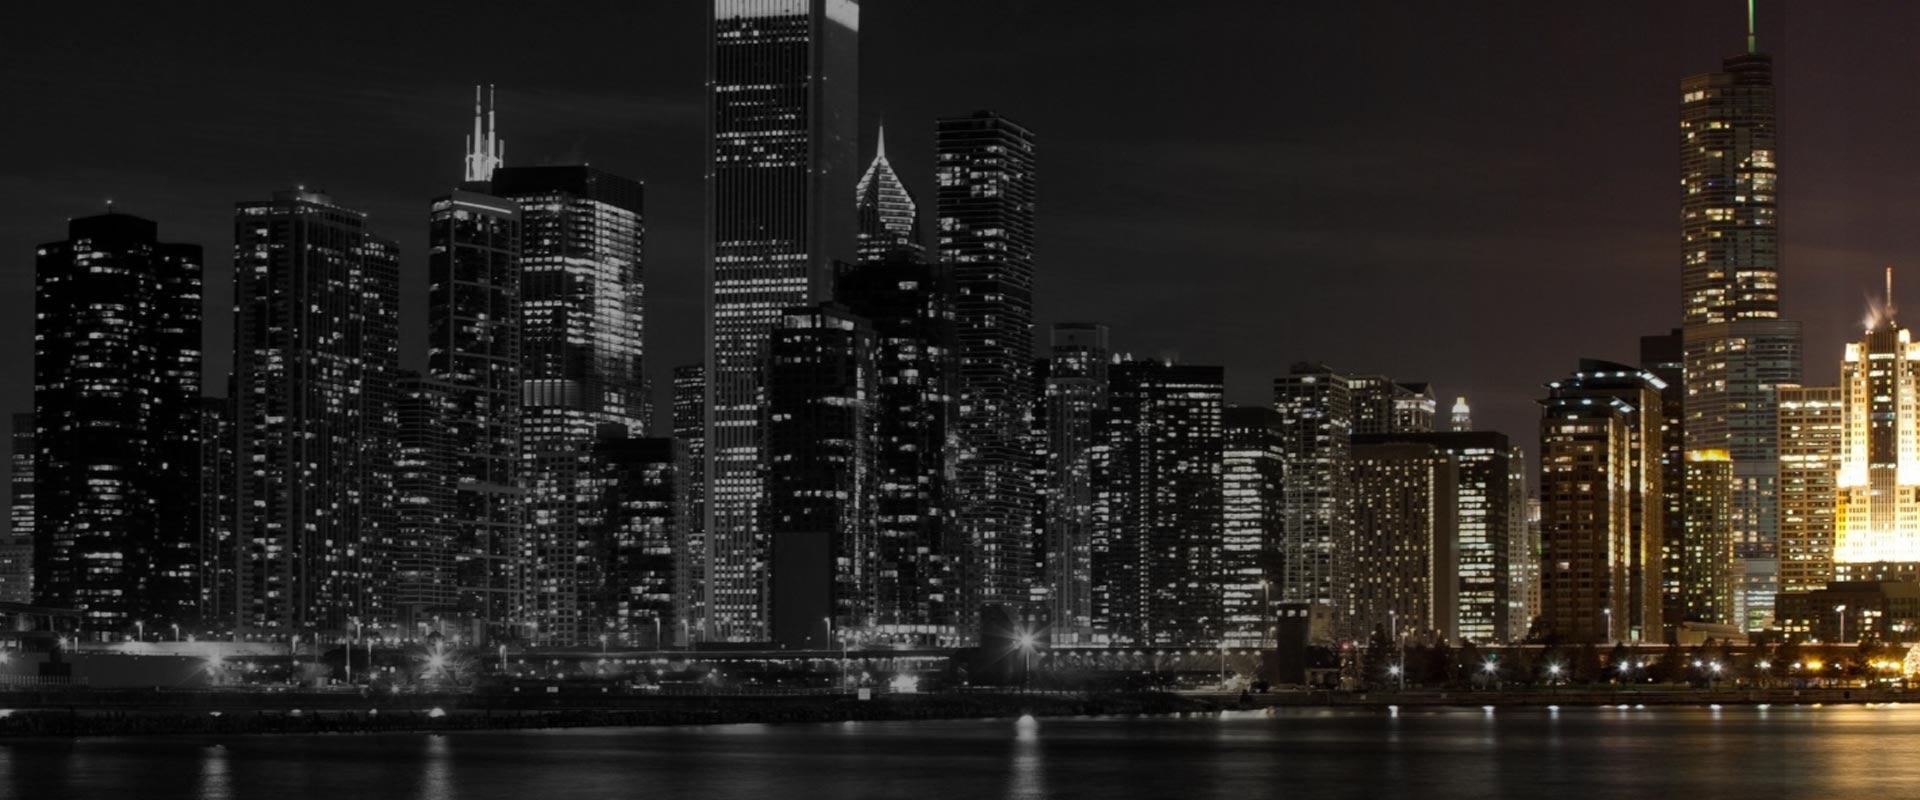 city3